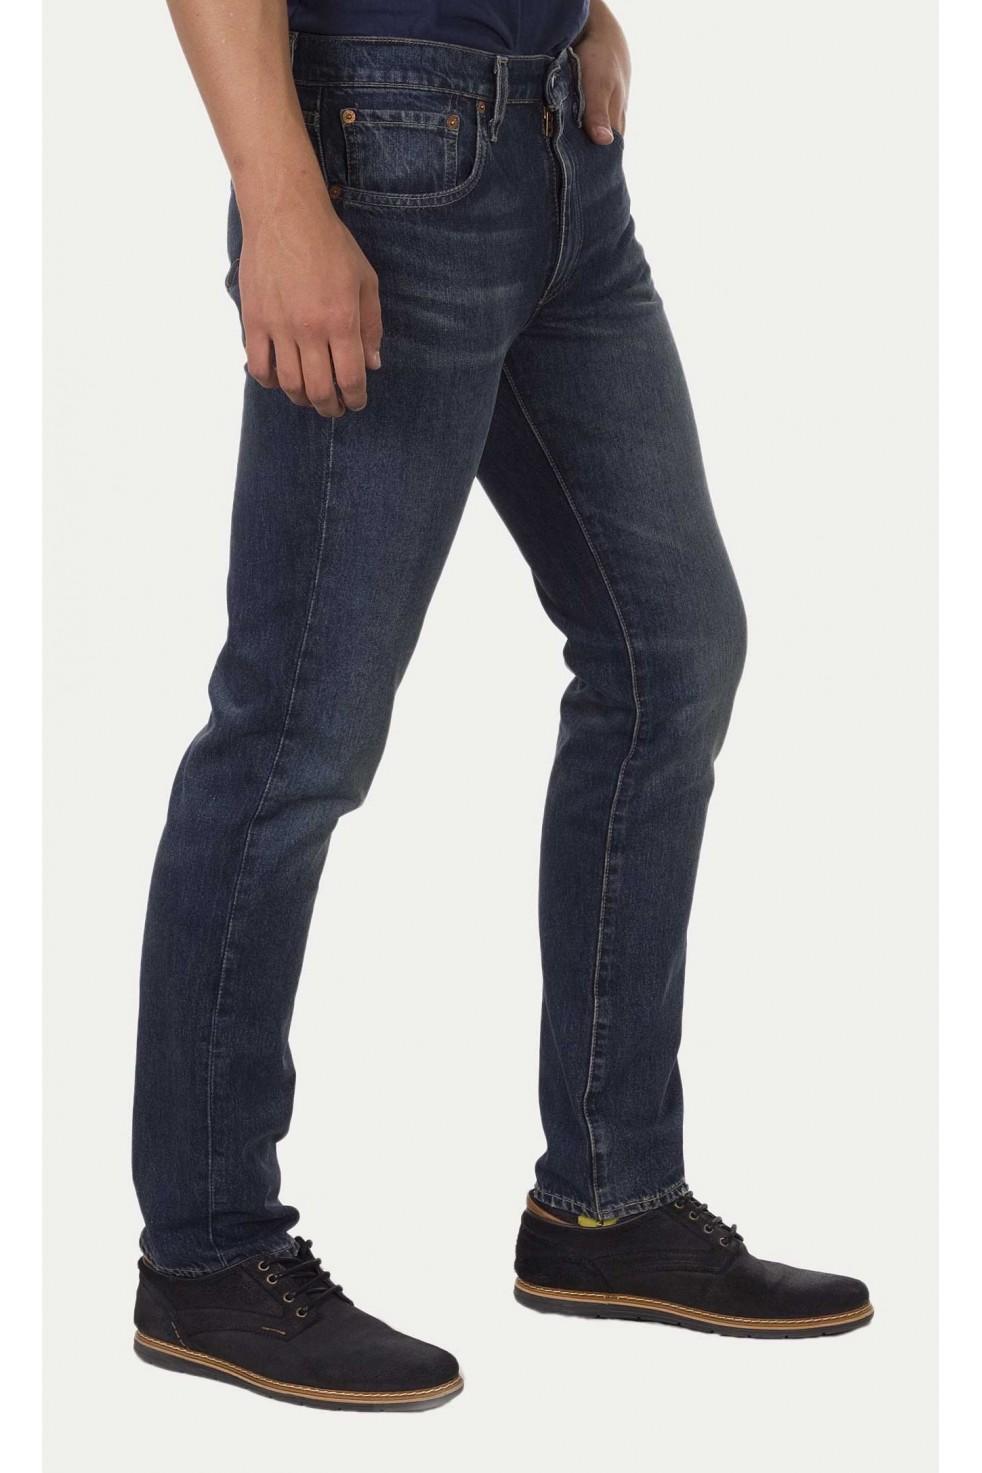 Levis Erkek Jean Pantolon 511 Slim Fıt 04511-2993